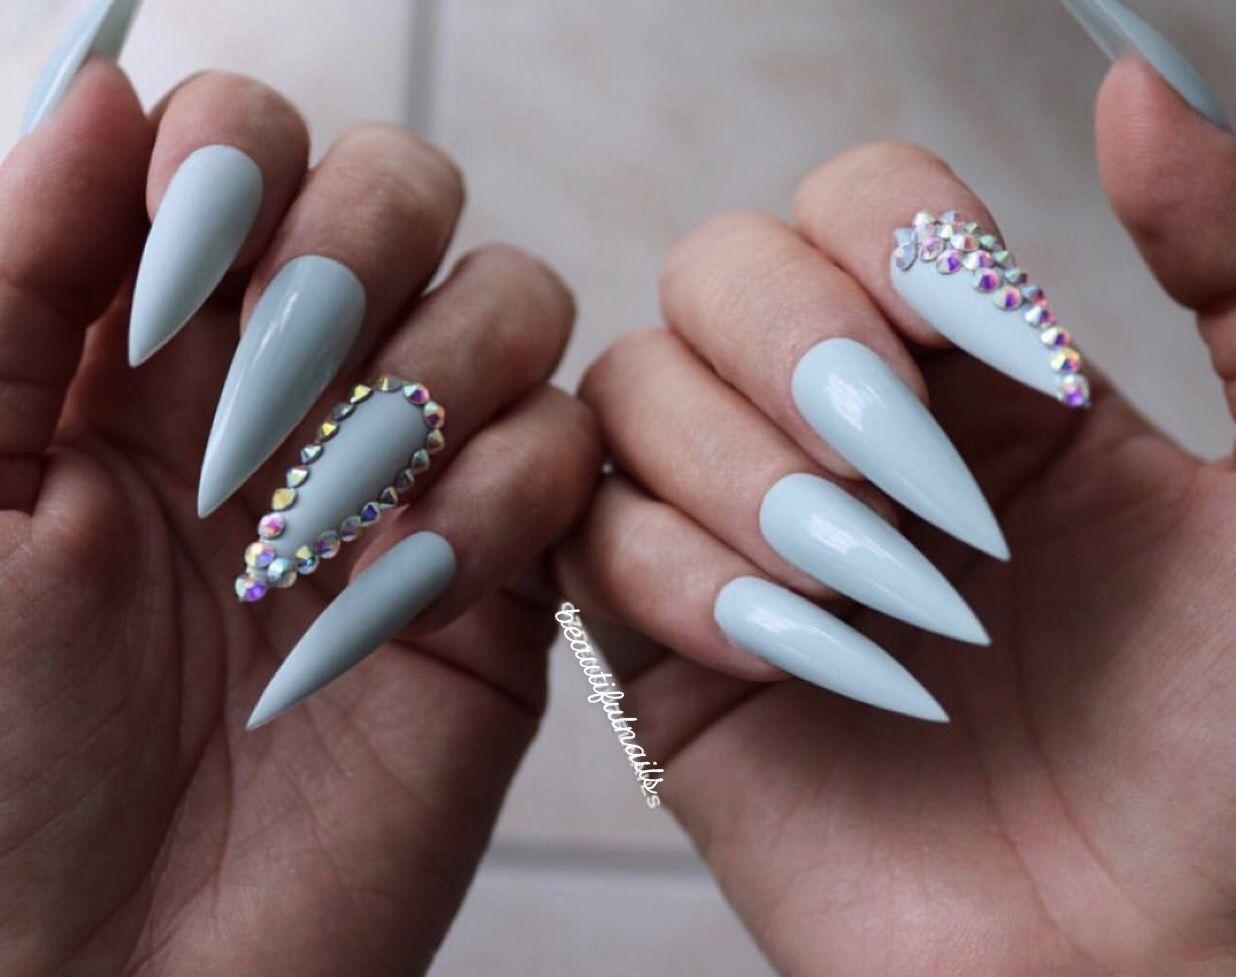 Light Blue Stiletto Nails With Rhinestones Blue Stiletto Nails Rhinestone Nails Light Blue Nails